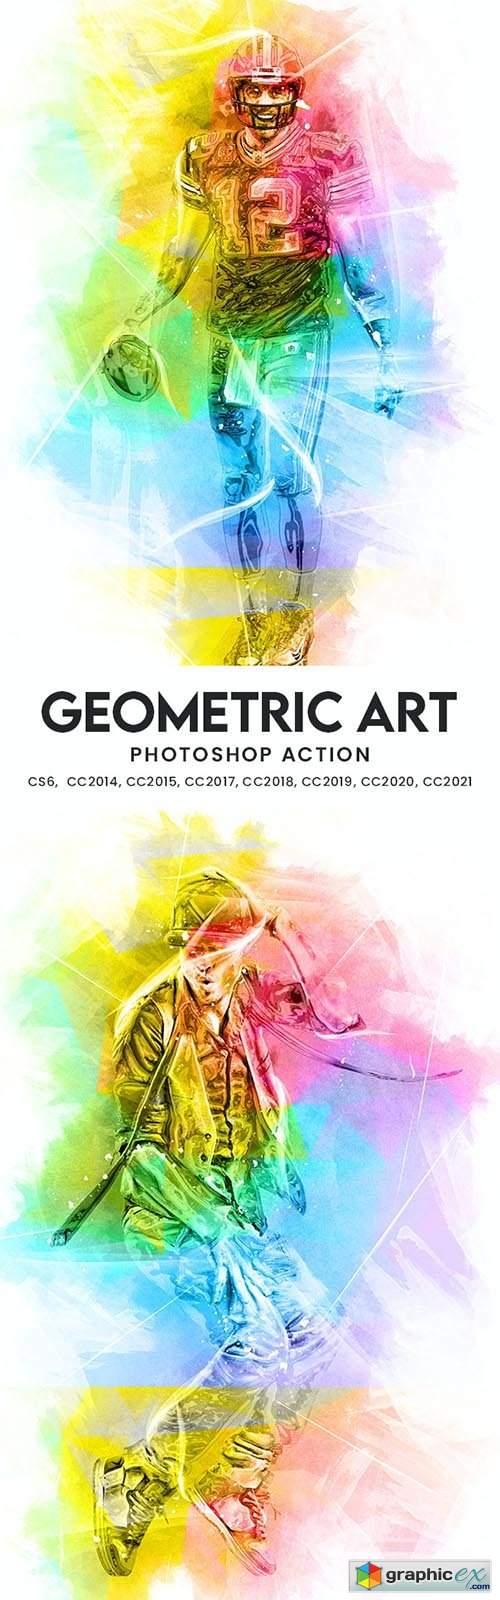 Geometric Art Photoshop Action 33954727